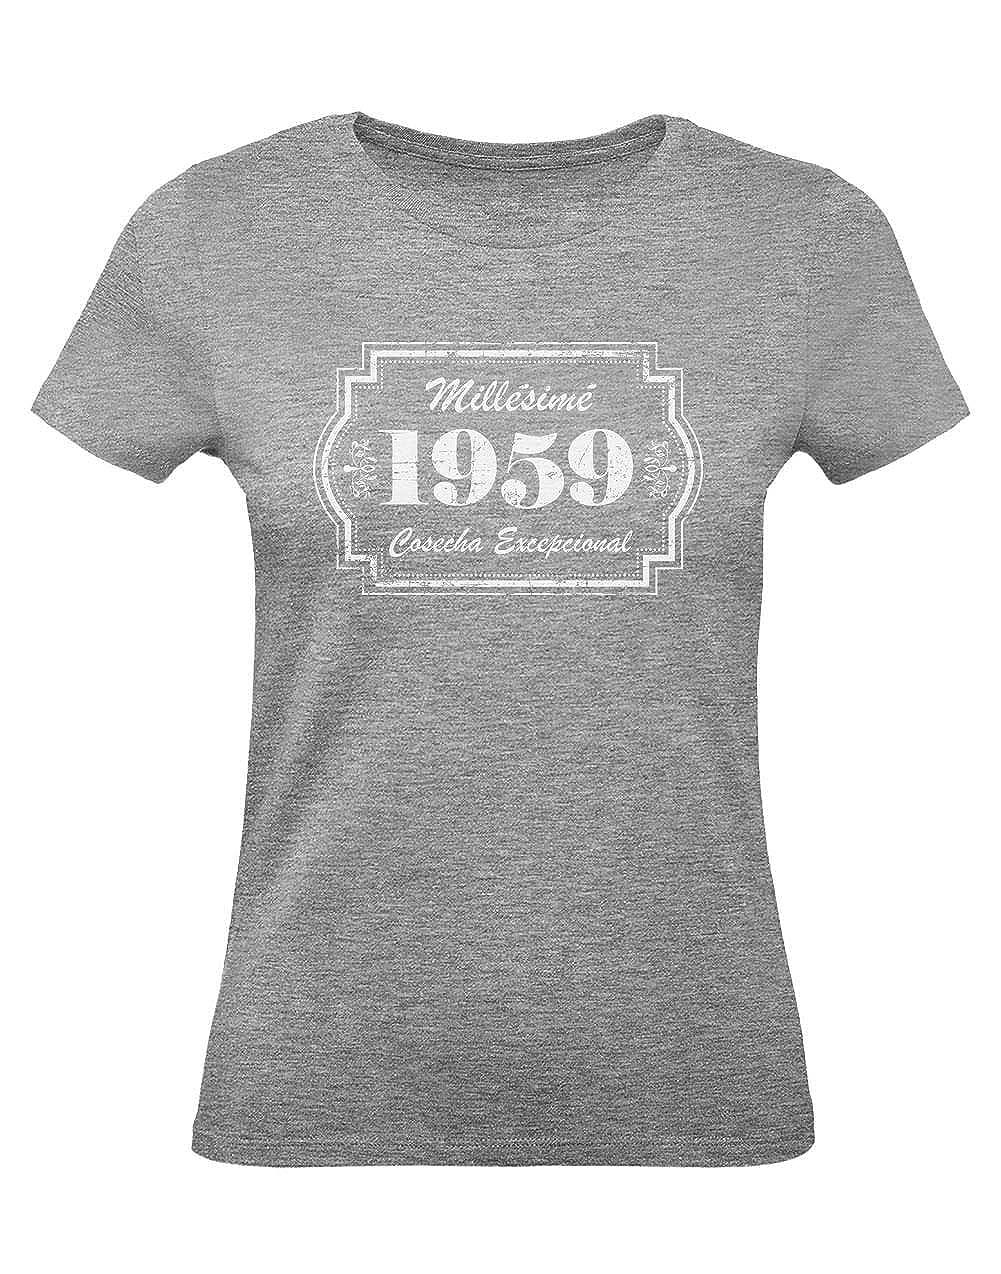 Green Turtle Camiseta para Mujer - 1959 Cosecha Excepcional ...